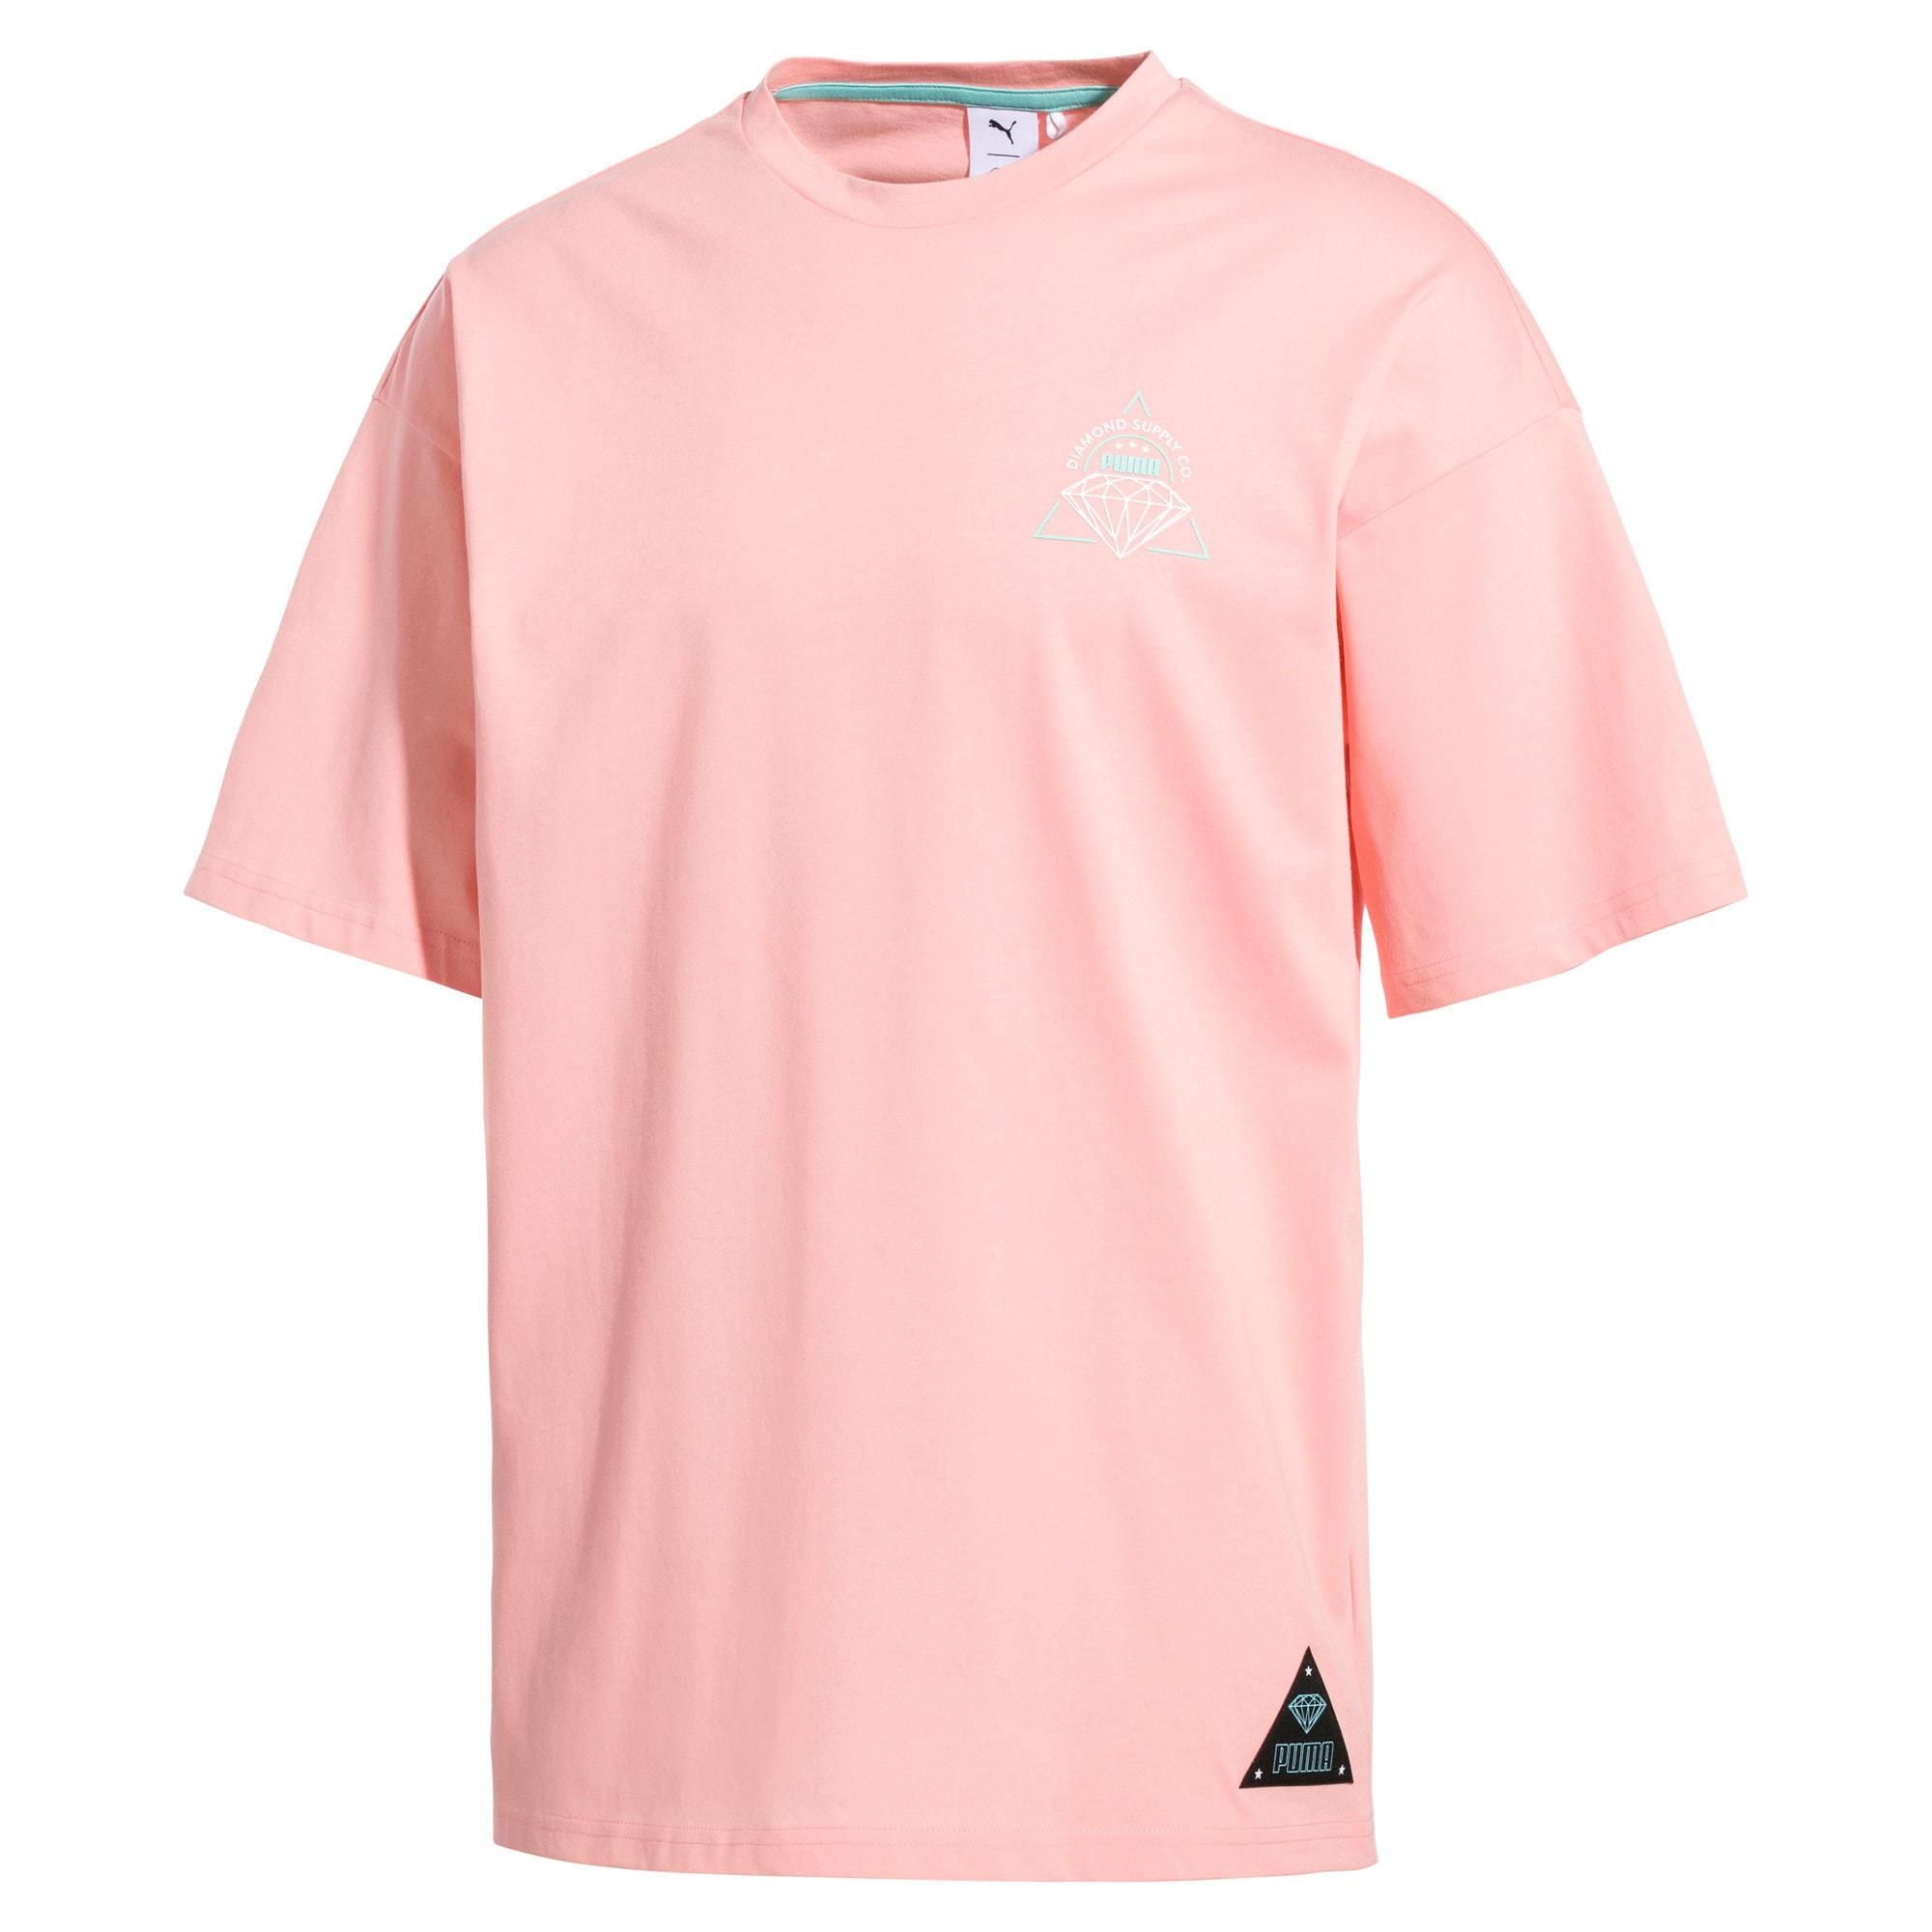 Thumbnail 1 of PUMA x DIAMOND T-shirt met korte mouwen voor heren, Peach Bud, medium